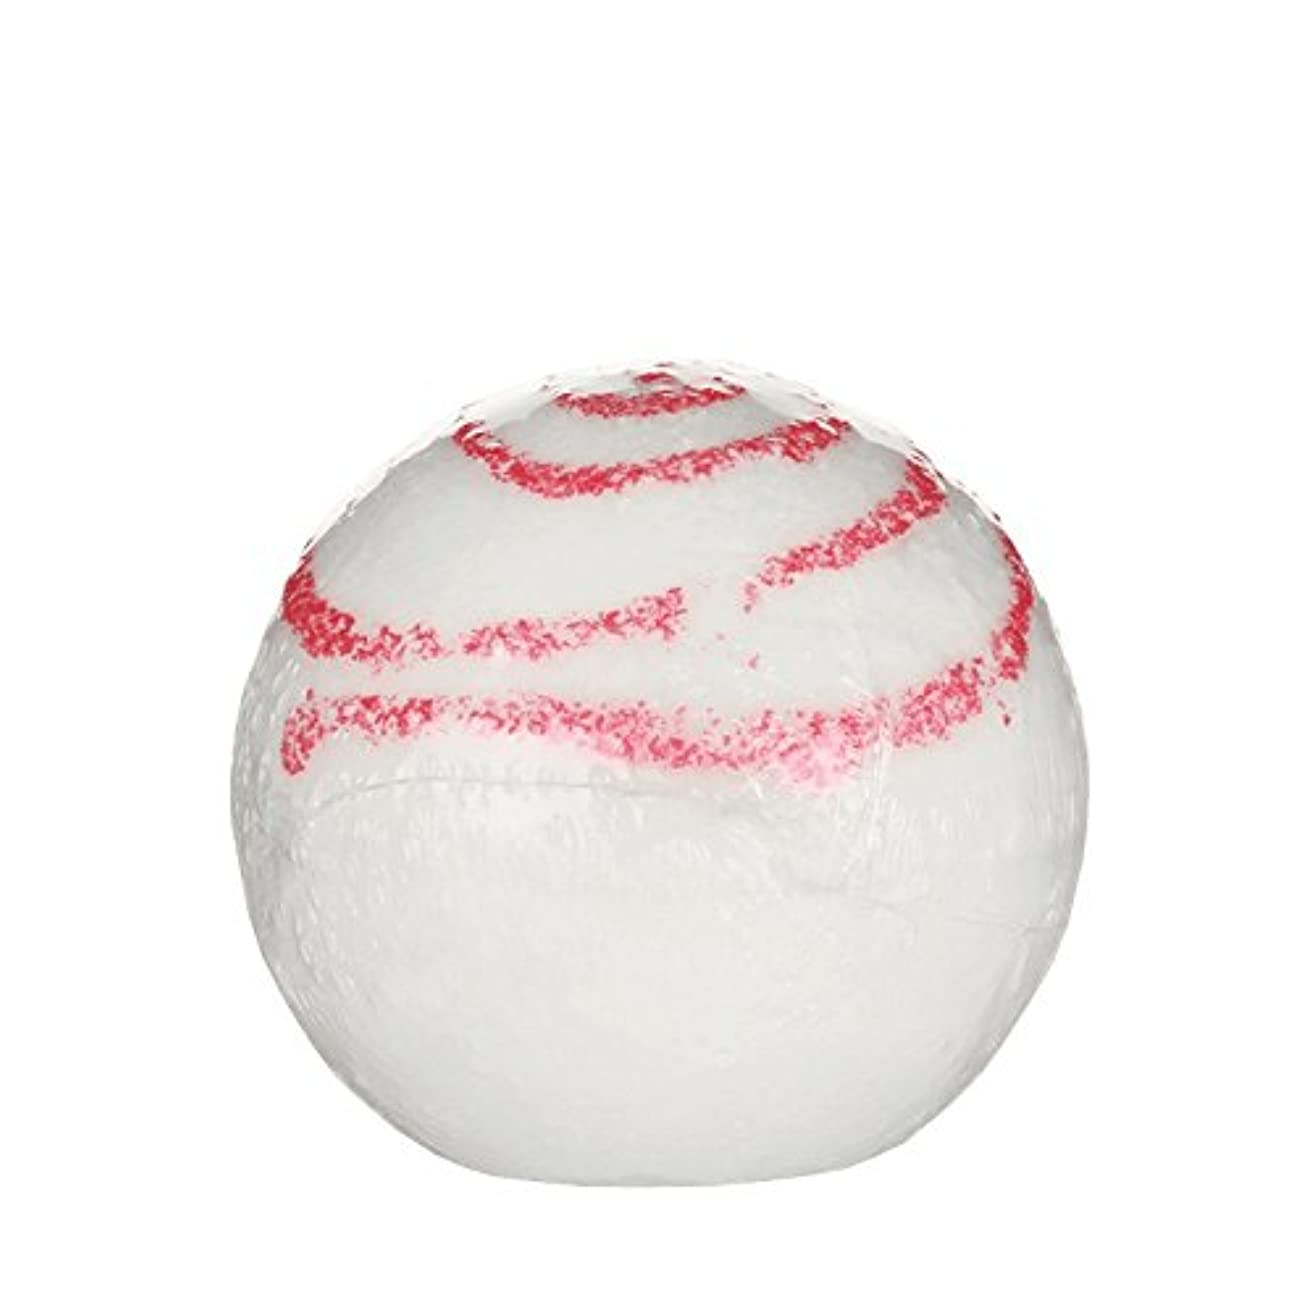 Treets Bath Ball Glitter Kiss 170g (Pack of 6) - Treetsバスボールグリッターキス170グラム (x6) [並行輸入品]